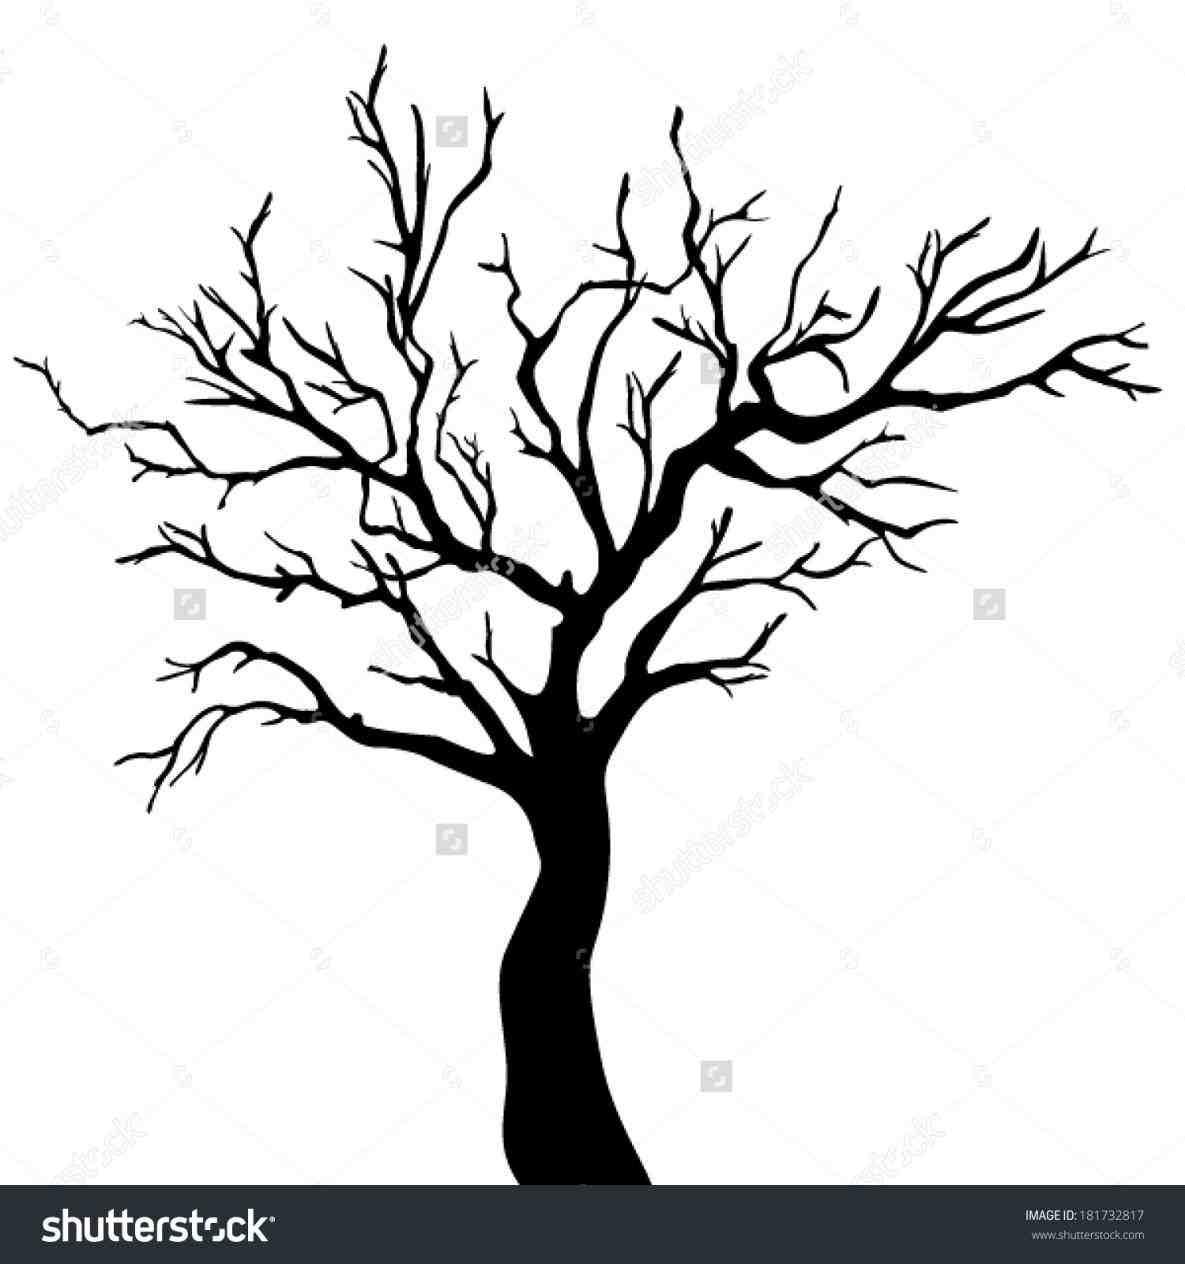 1185x1264 Big Dead Tree Drawing Ngorong.club Bare Trees